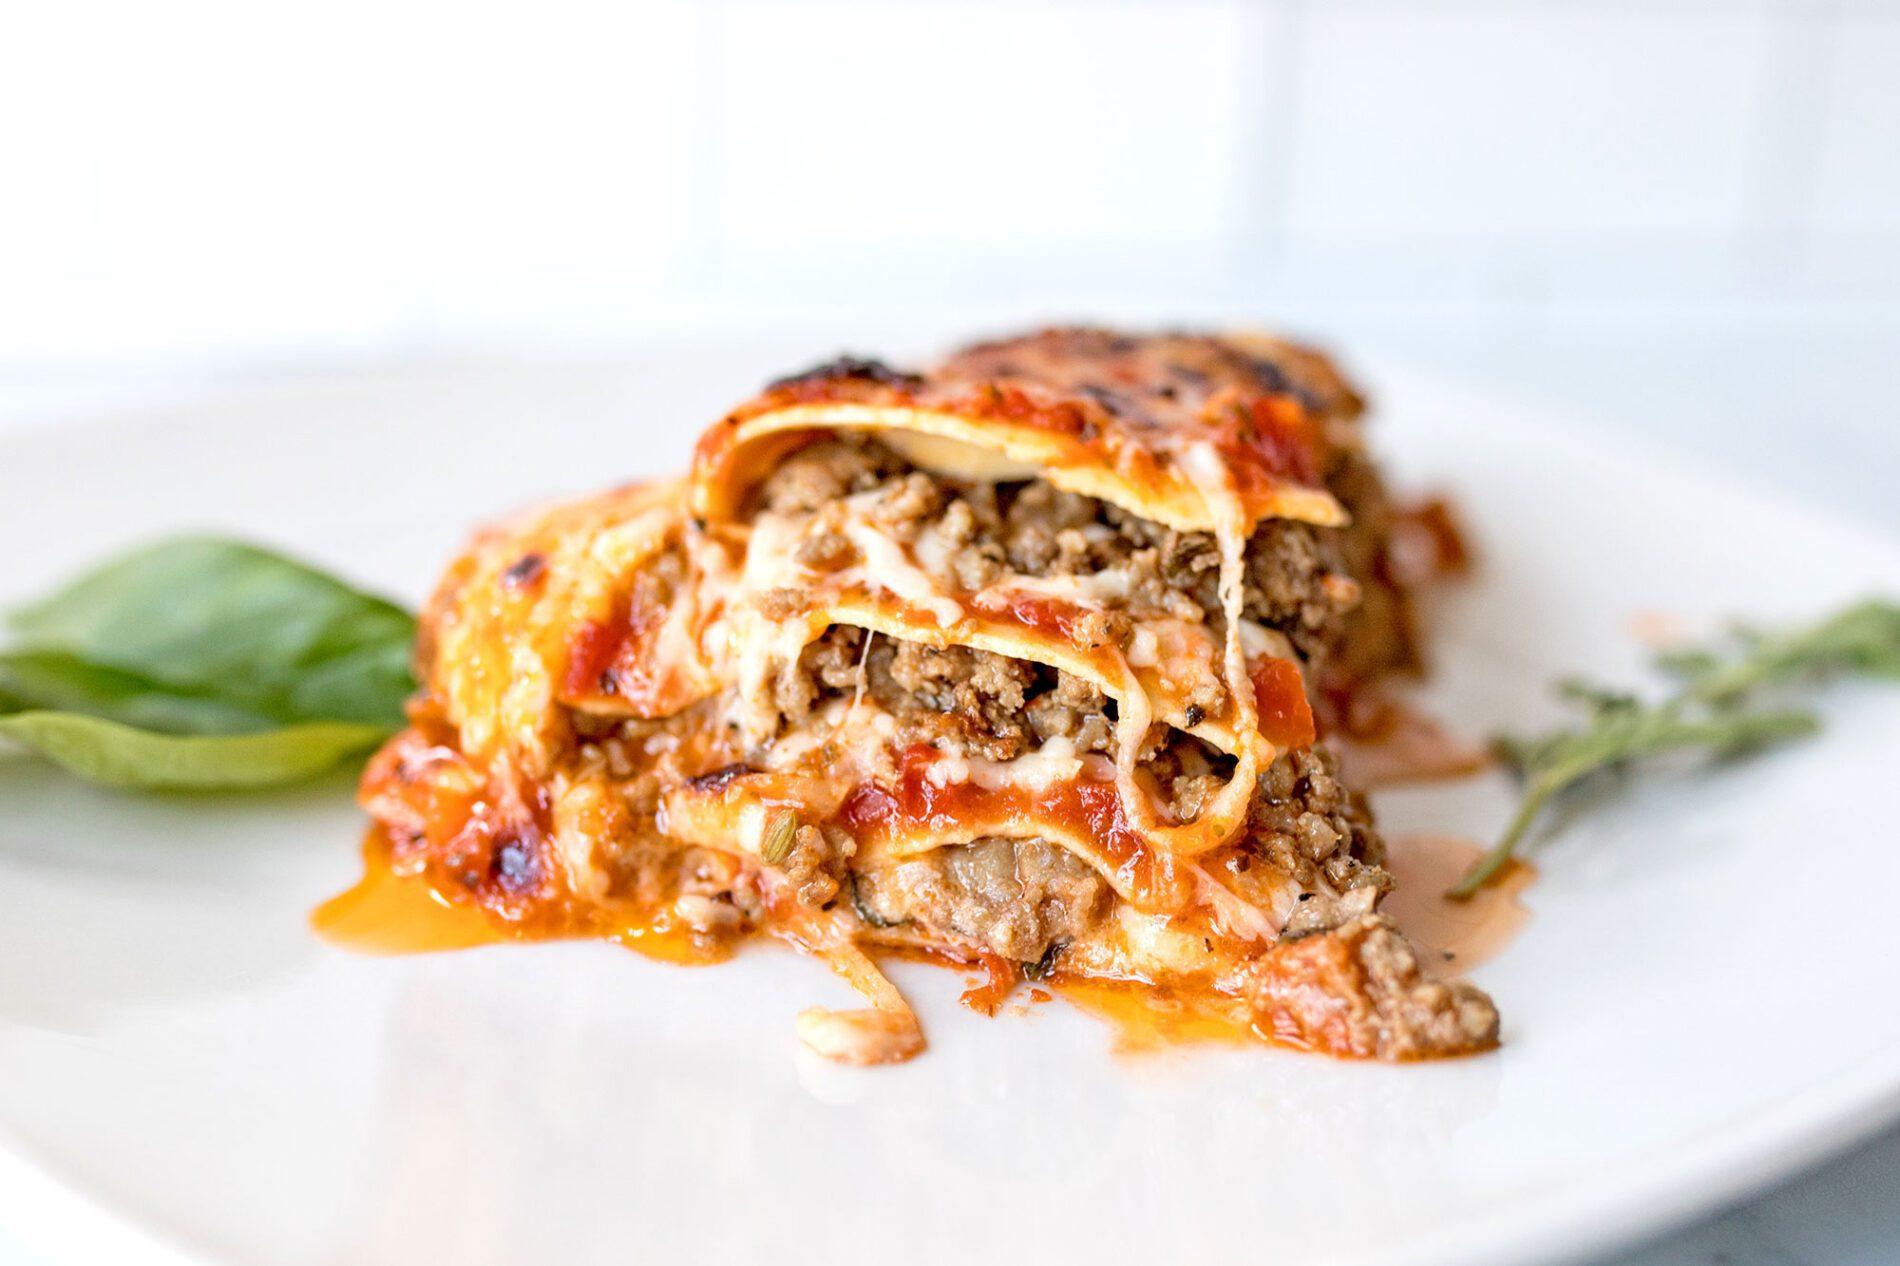 slice of super meaty and cheesy lasagna